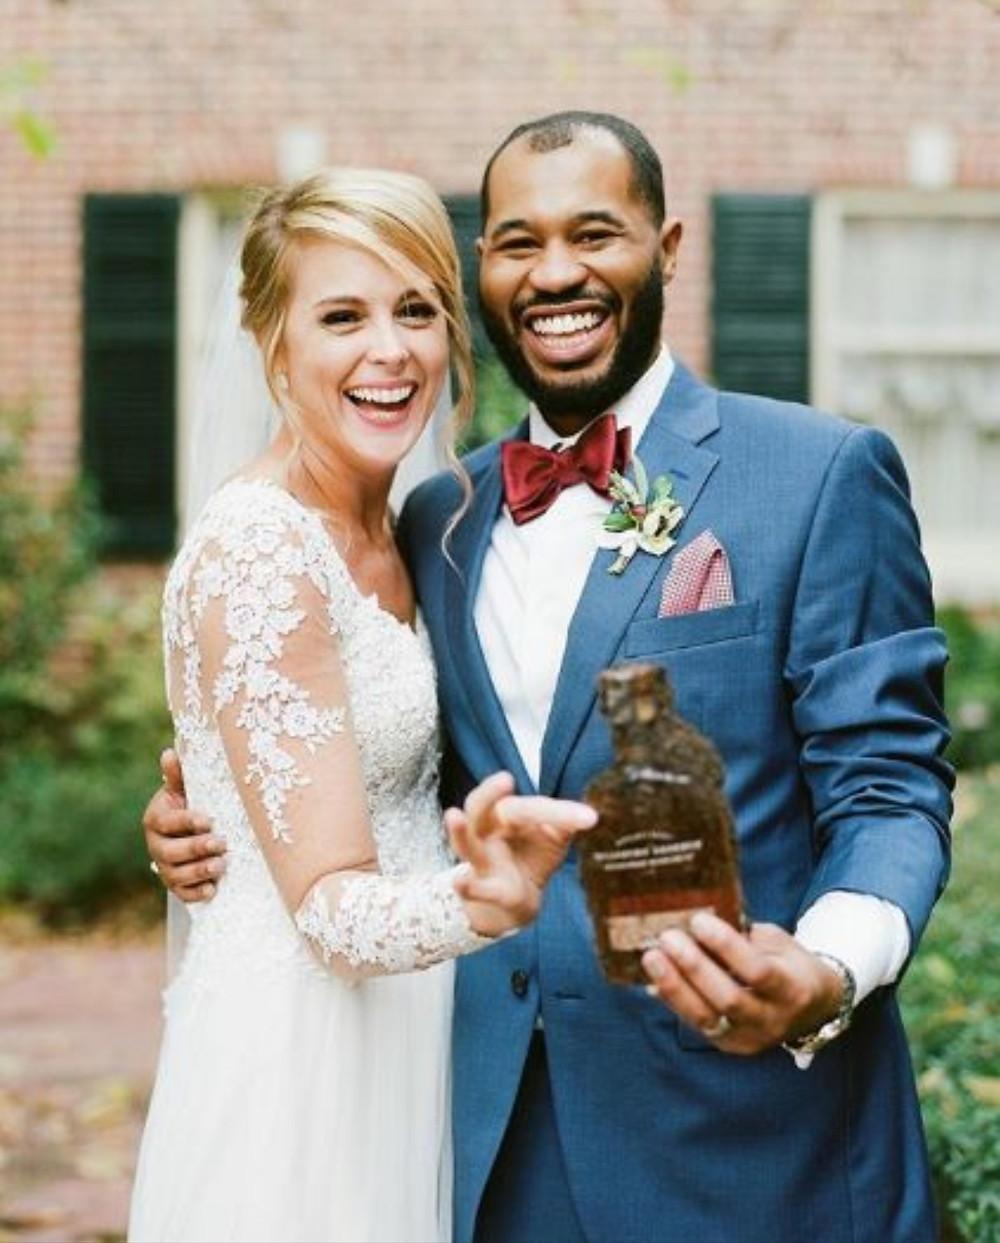 Bride and Groom Burying Bourbon